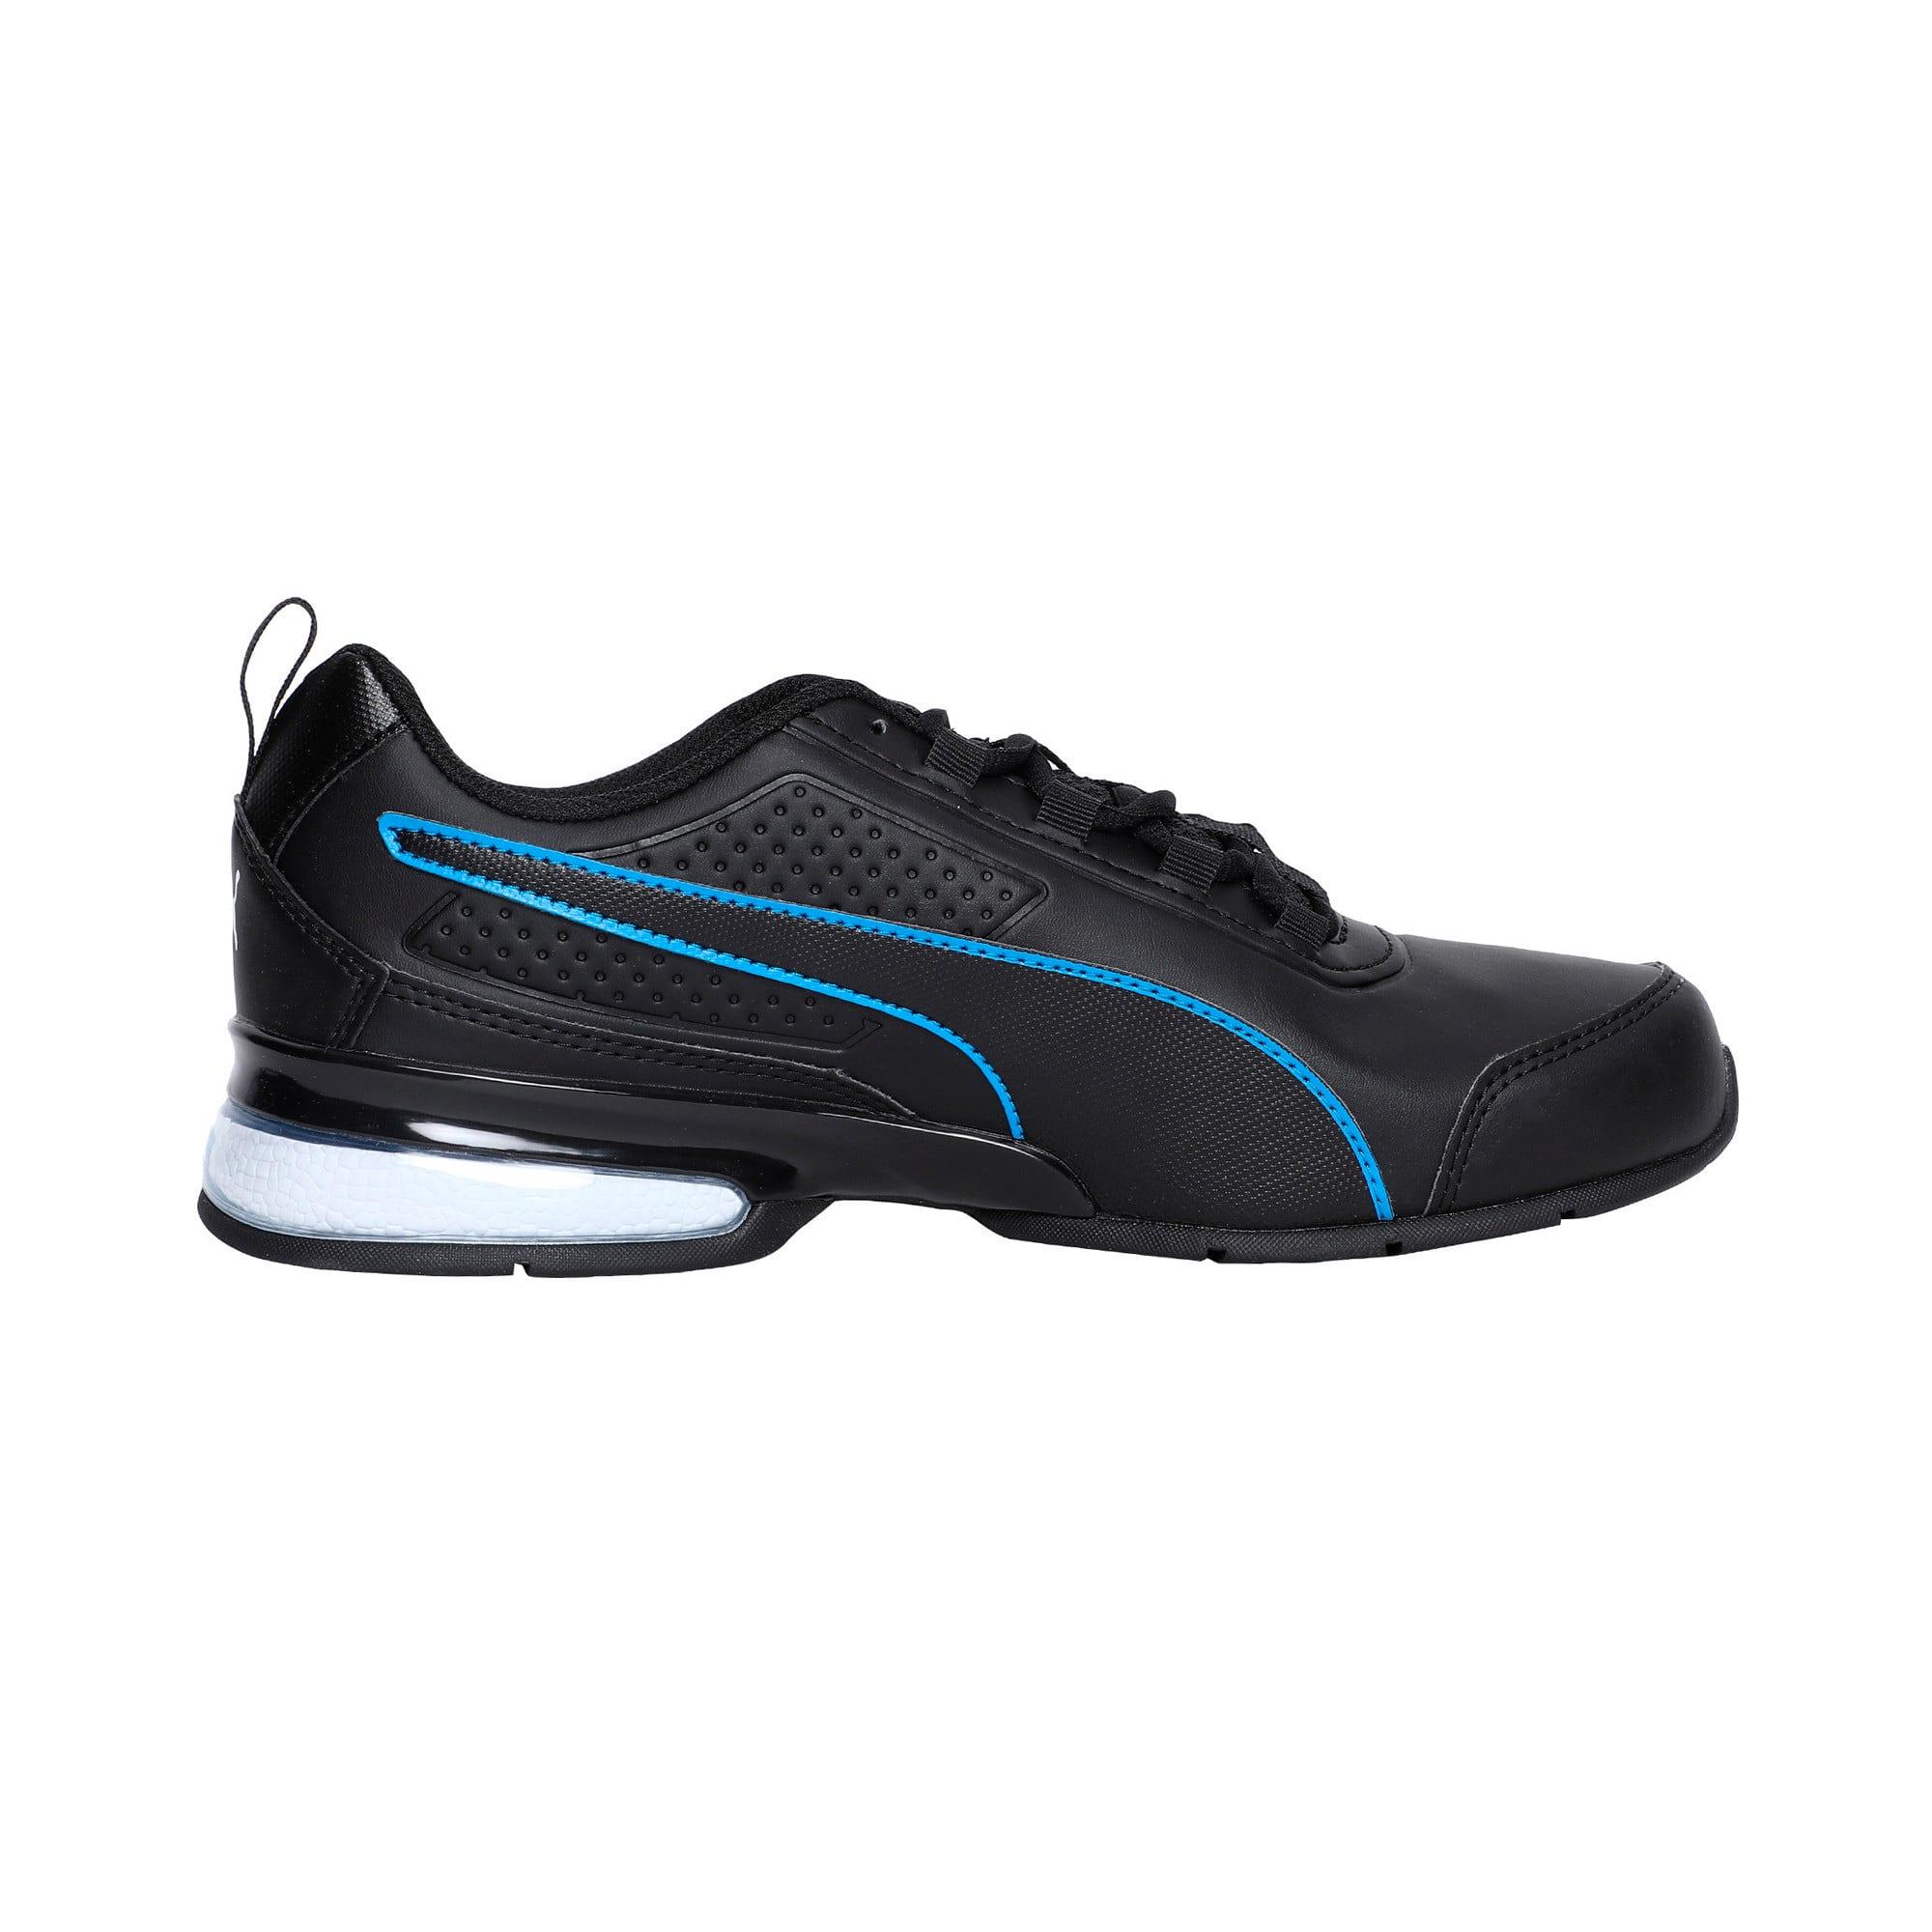 Thumbnail 4 of Leader VT SL Running Shoes, Black-White-Indigo Bunting, medium-IND